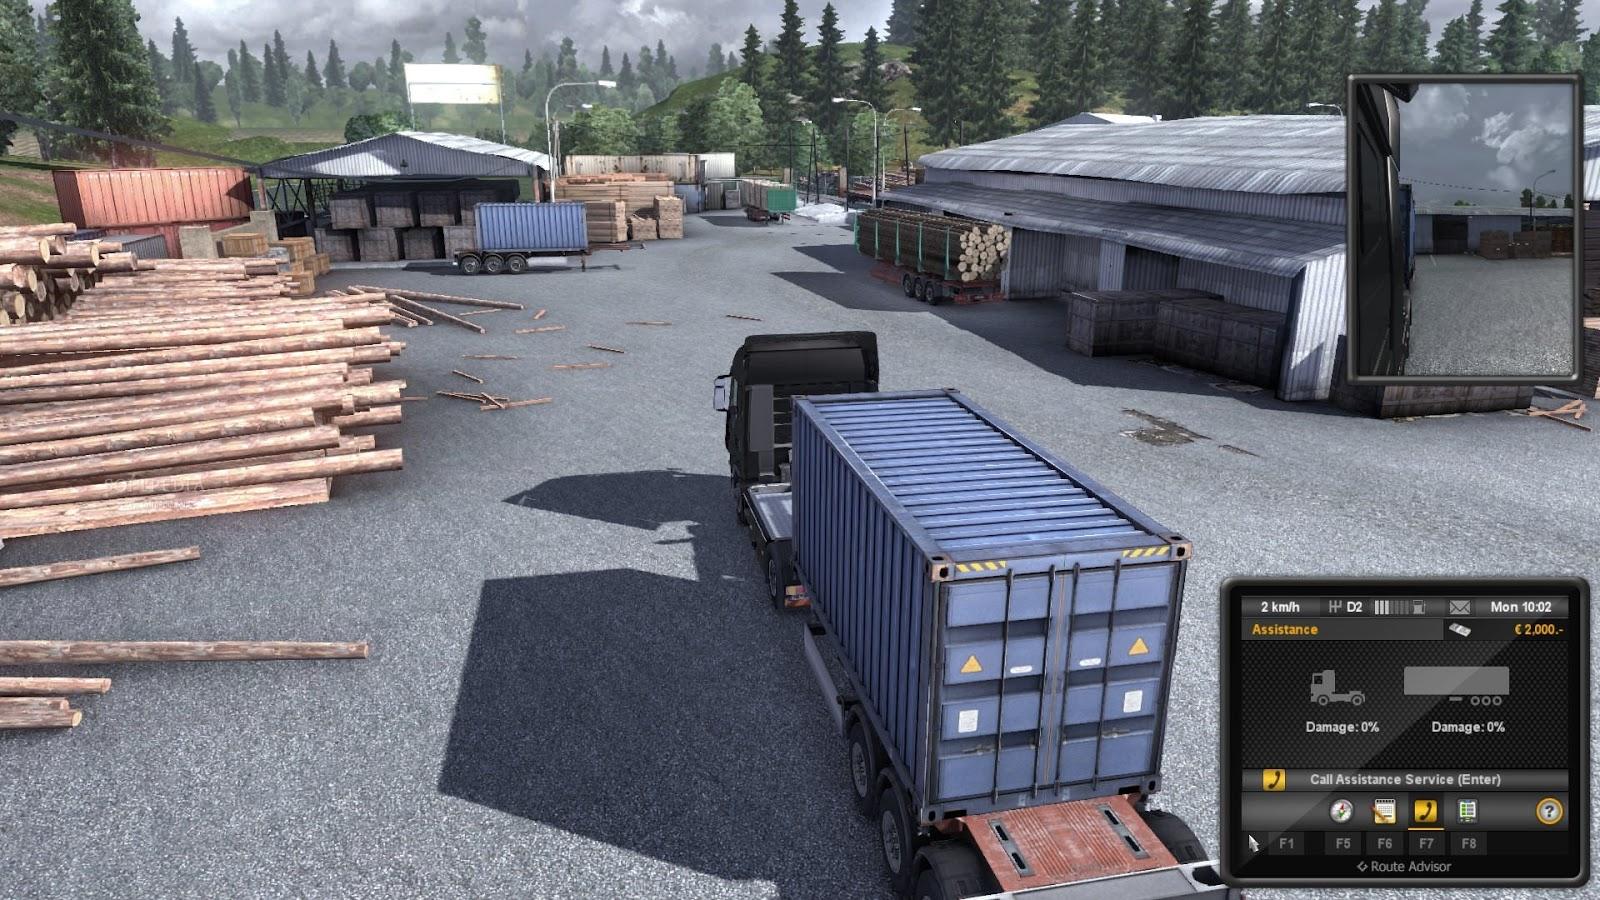 Download Euro Truck Simulator 2 Nosteam Tpb | Fulham SEO